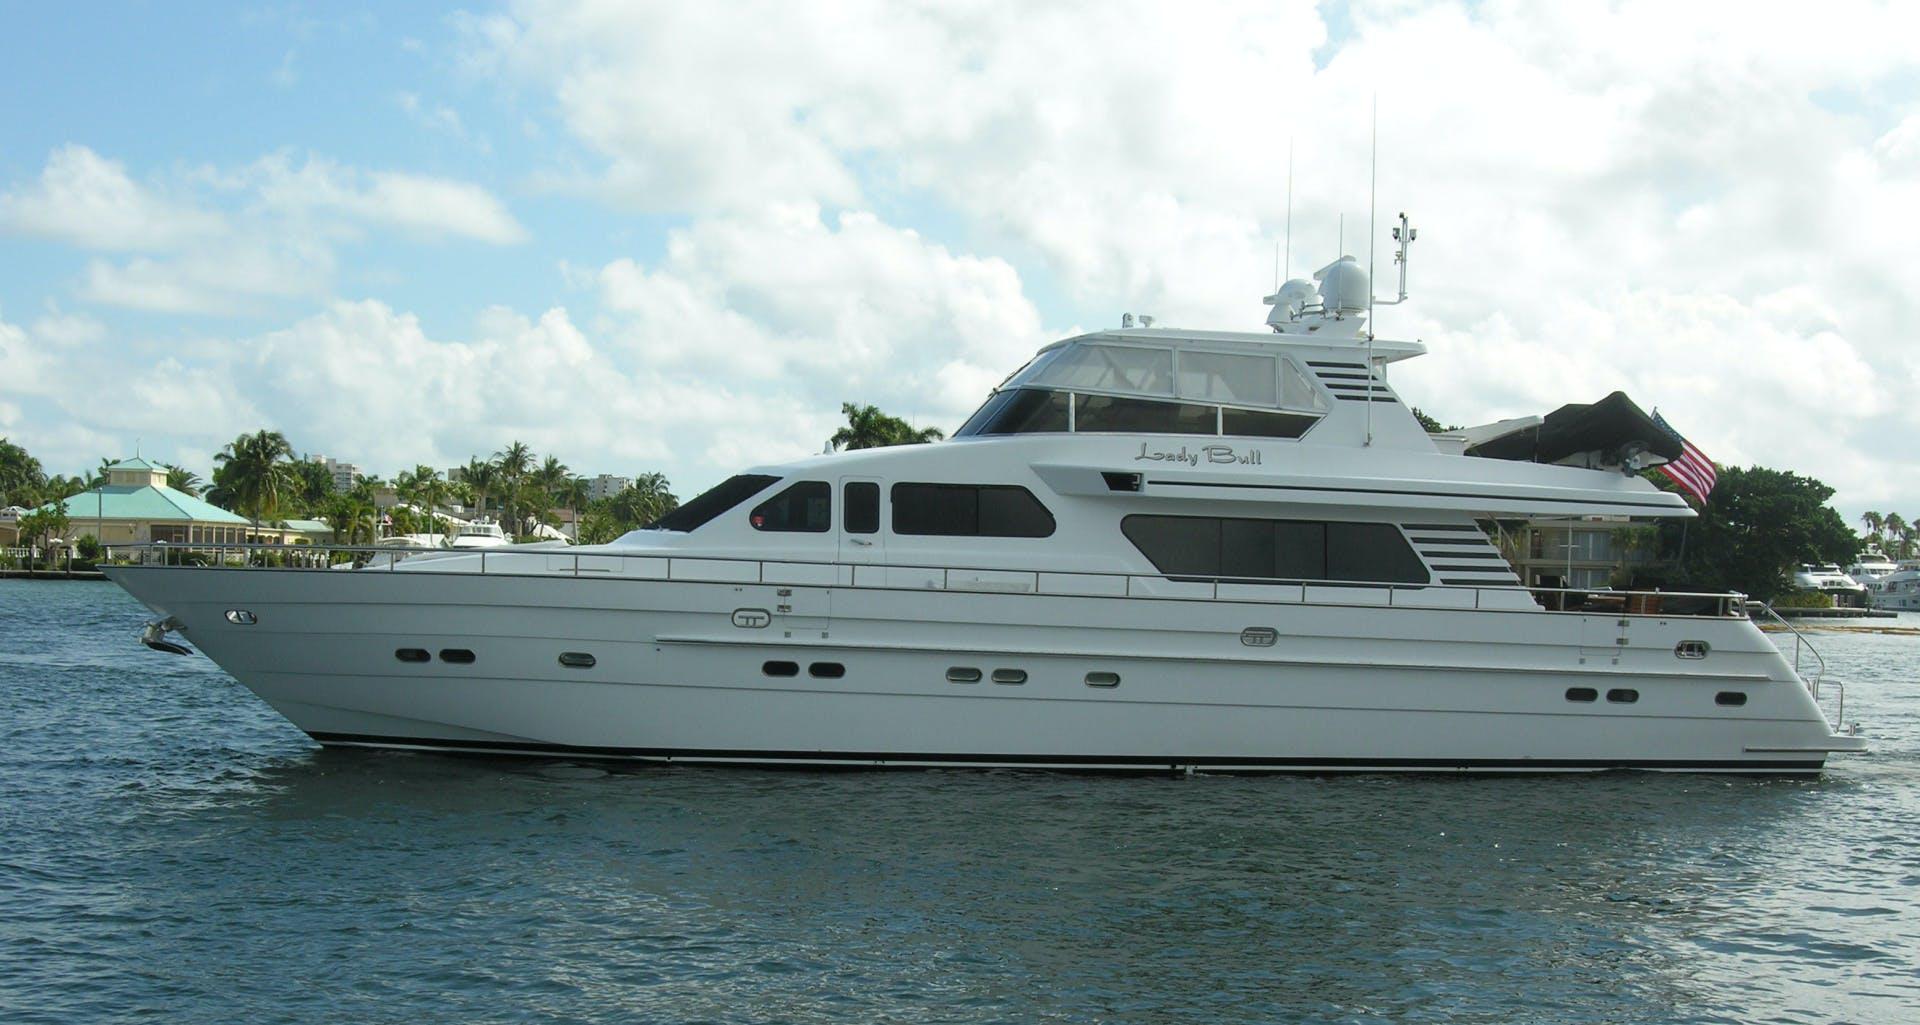 2001 Horizon 82' Flybridge Motor Yacht LADY BULL   Picture 1 of 88